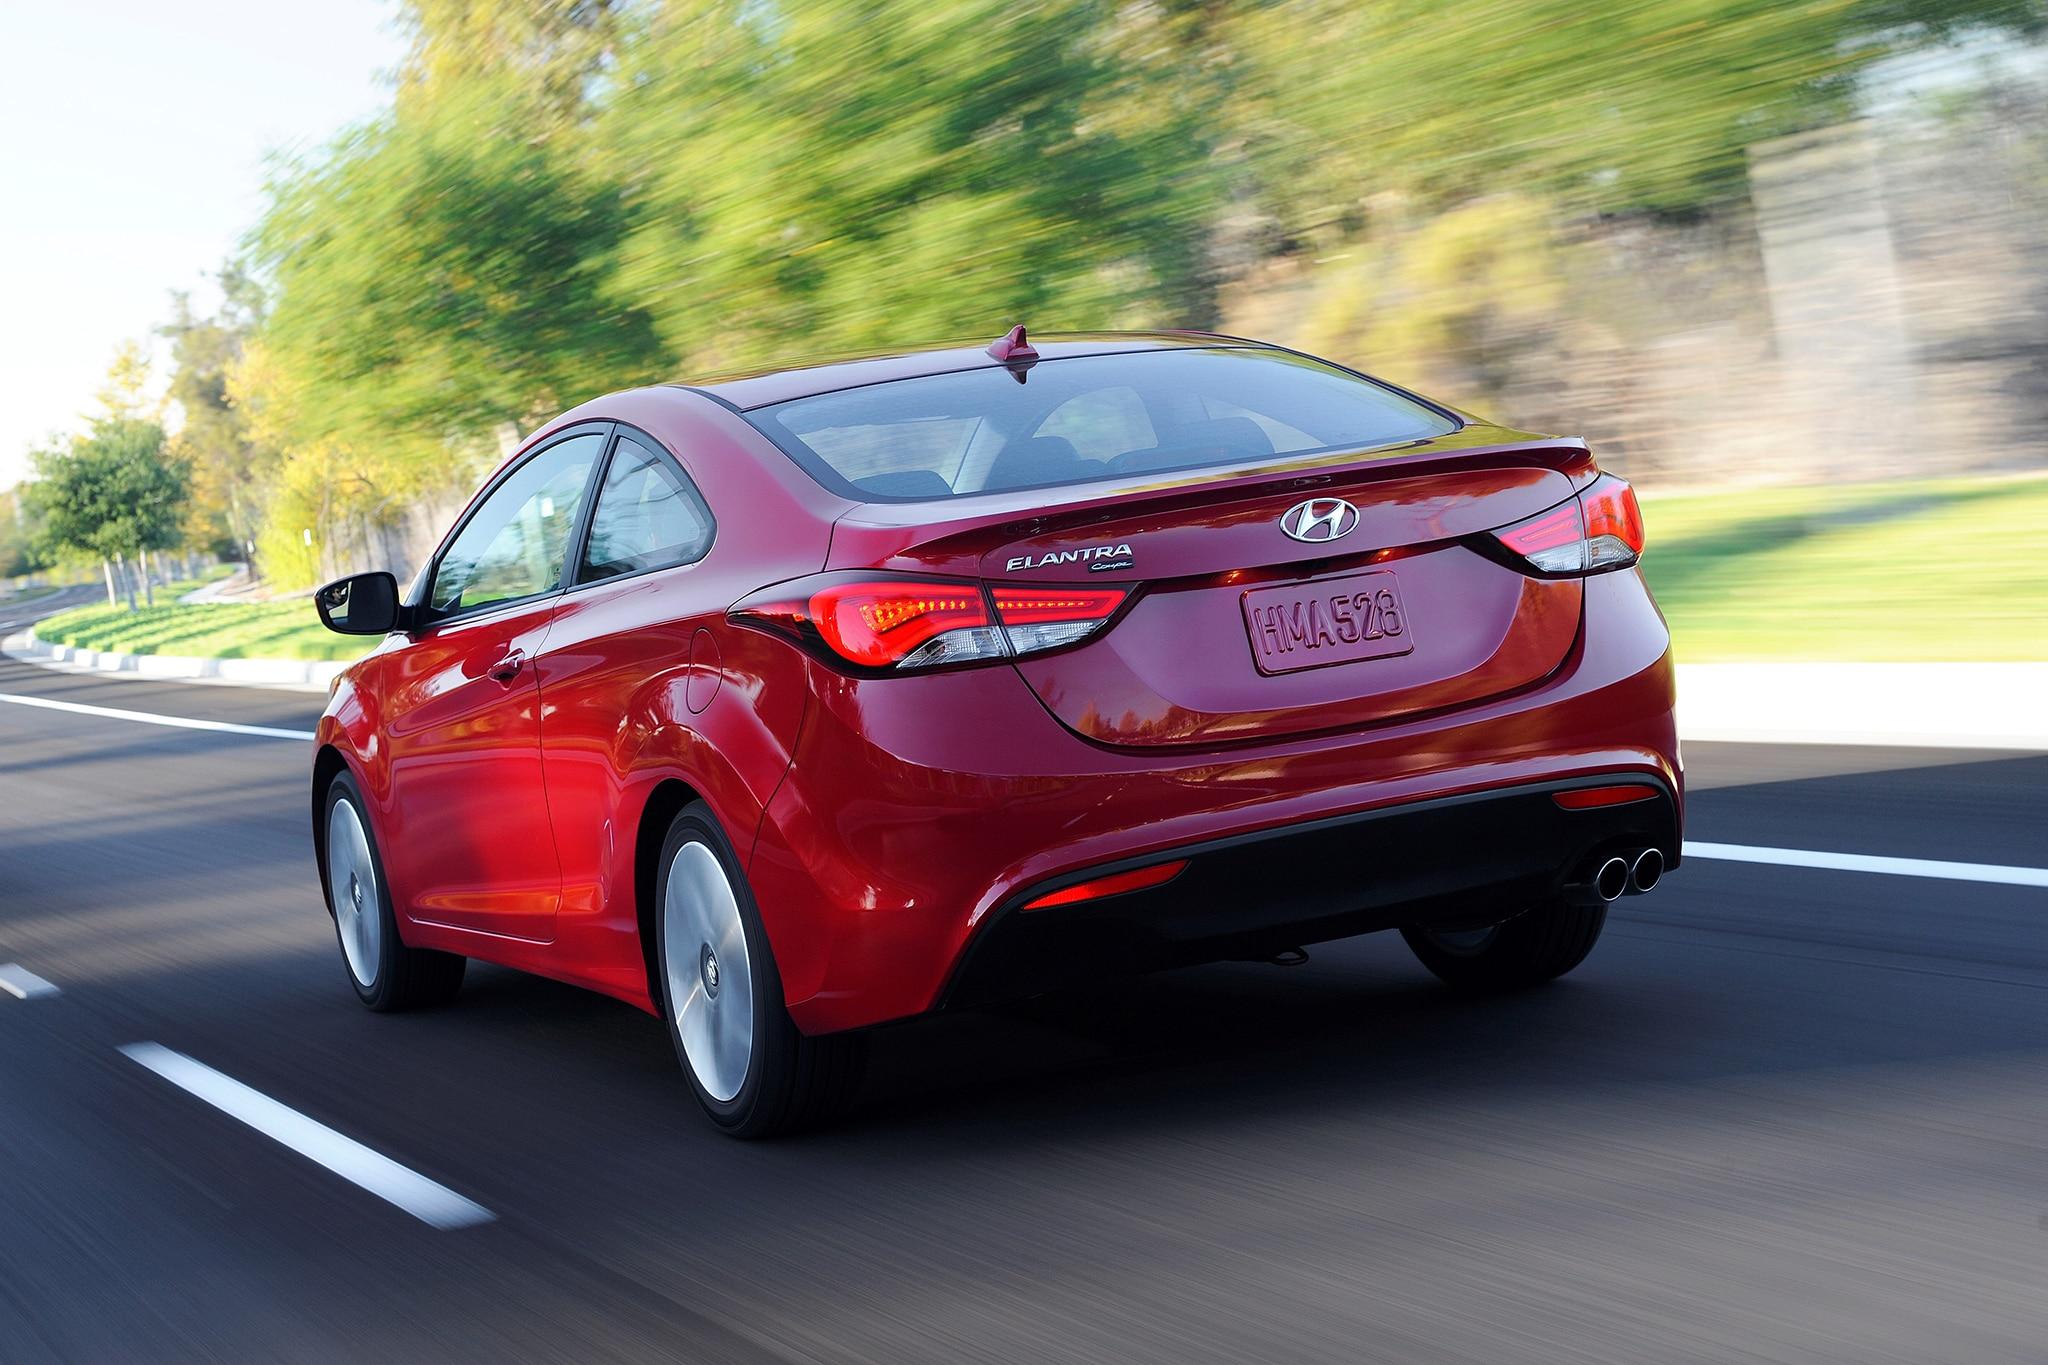 Hyundai Elantra Coupe Discontinued for 2015